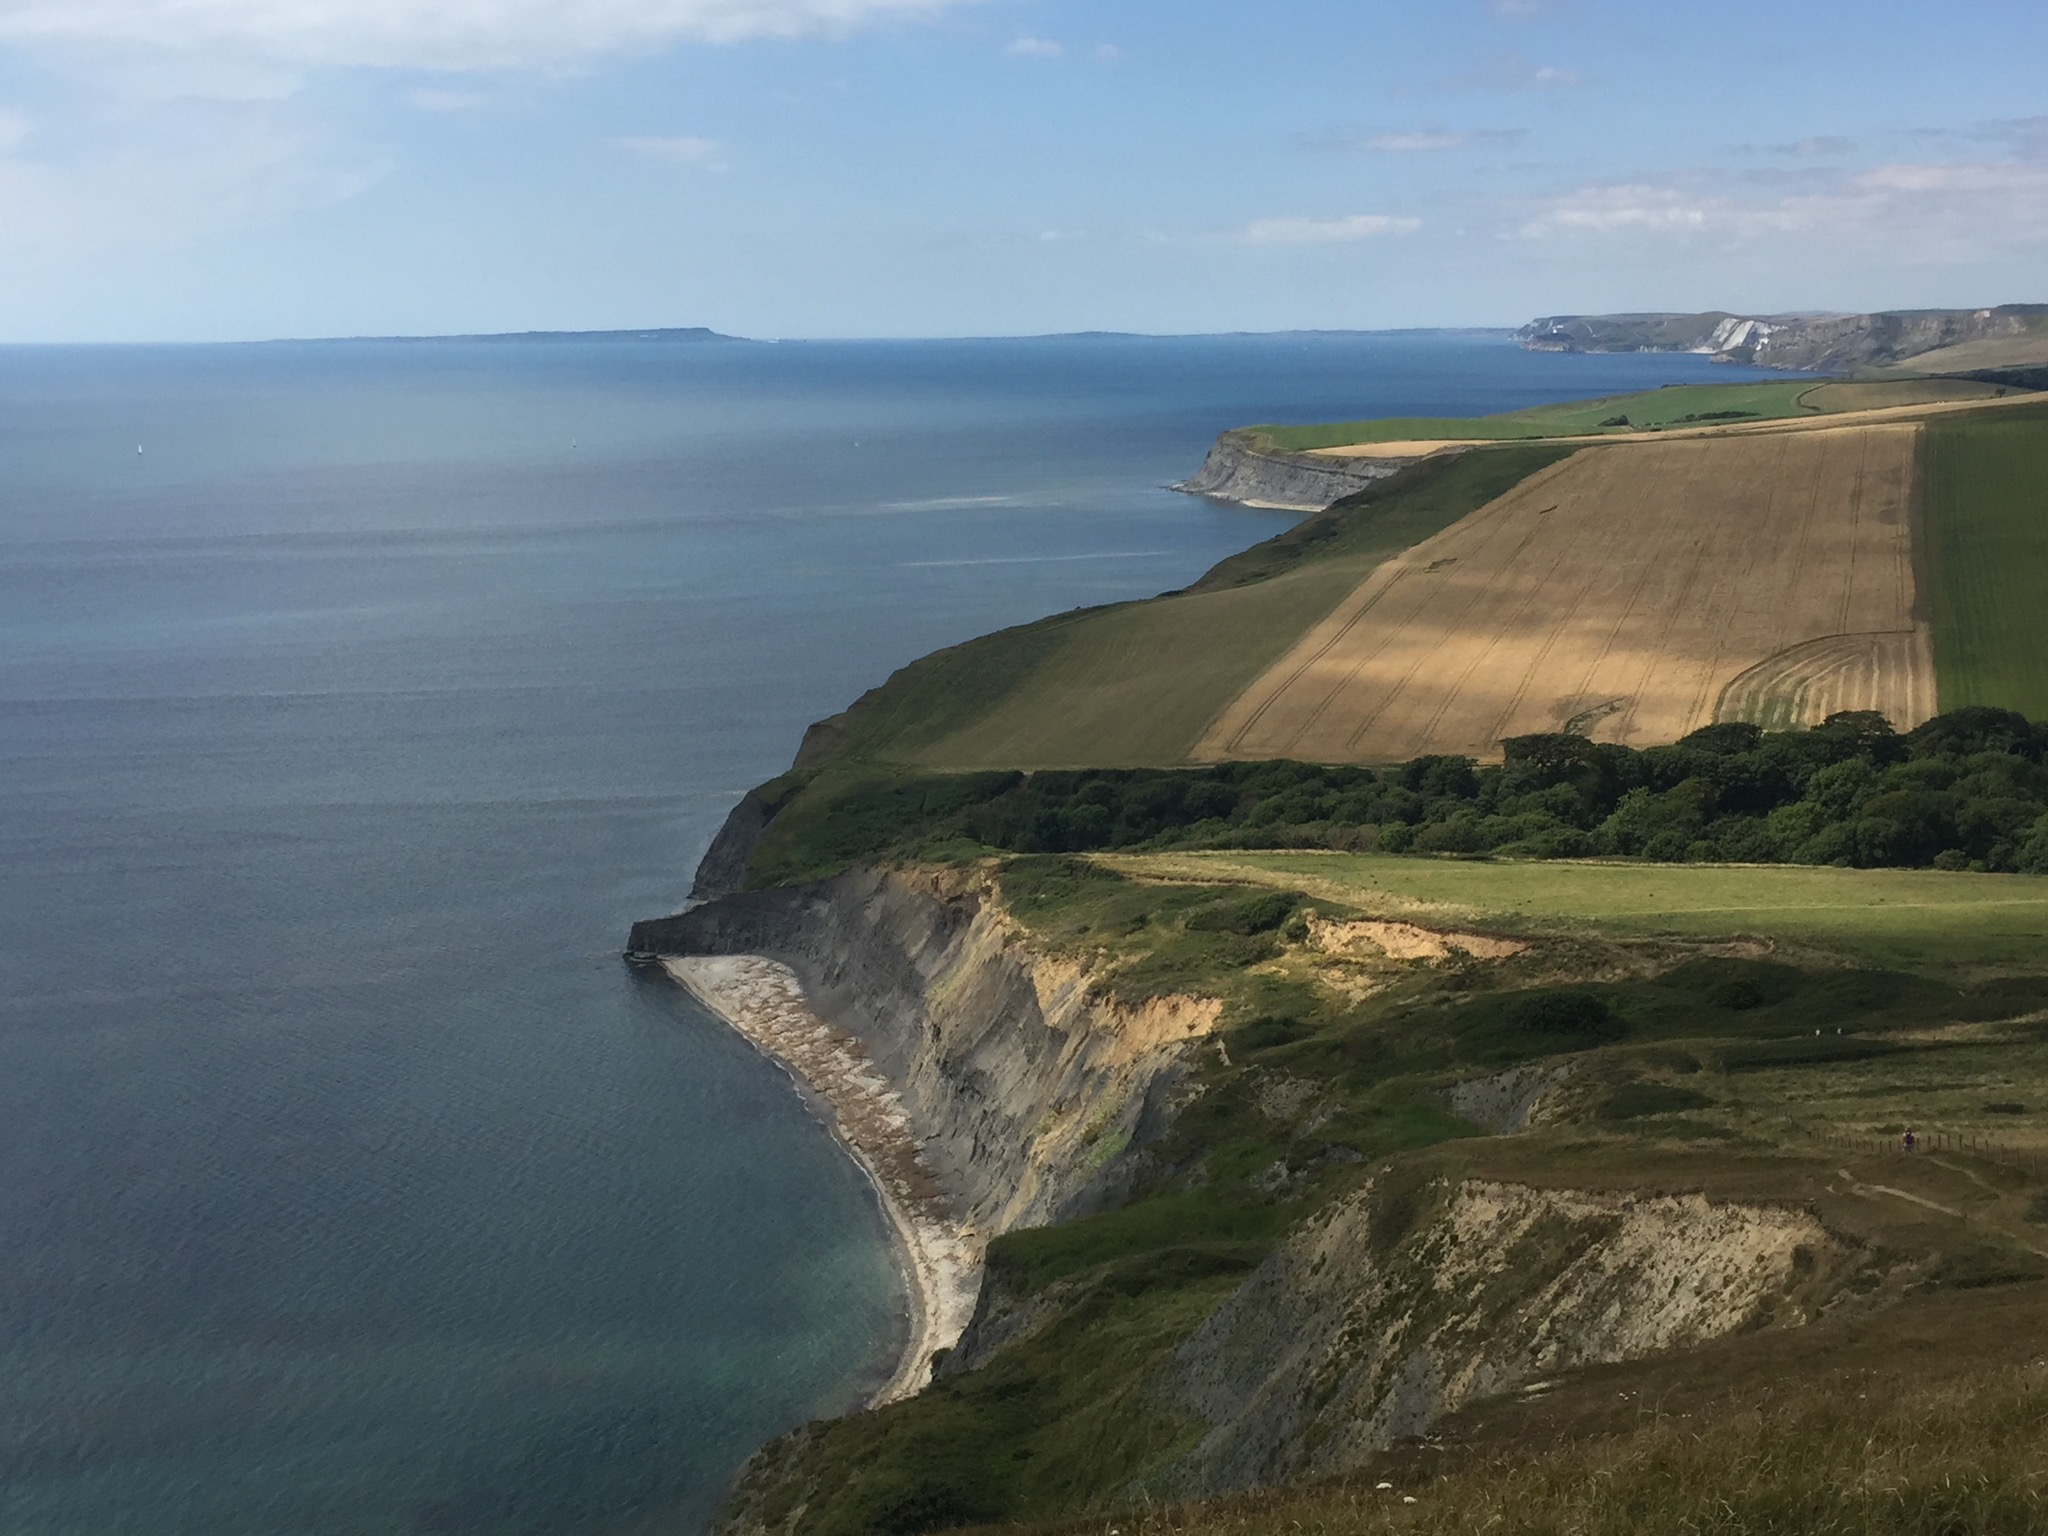 Houns-tout Dorset SWCP